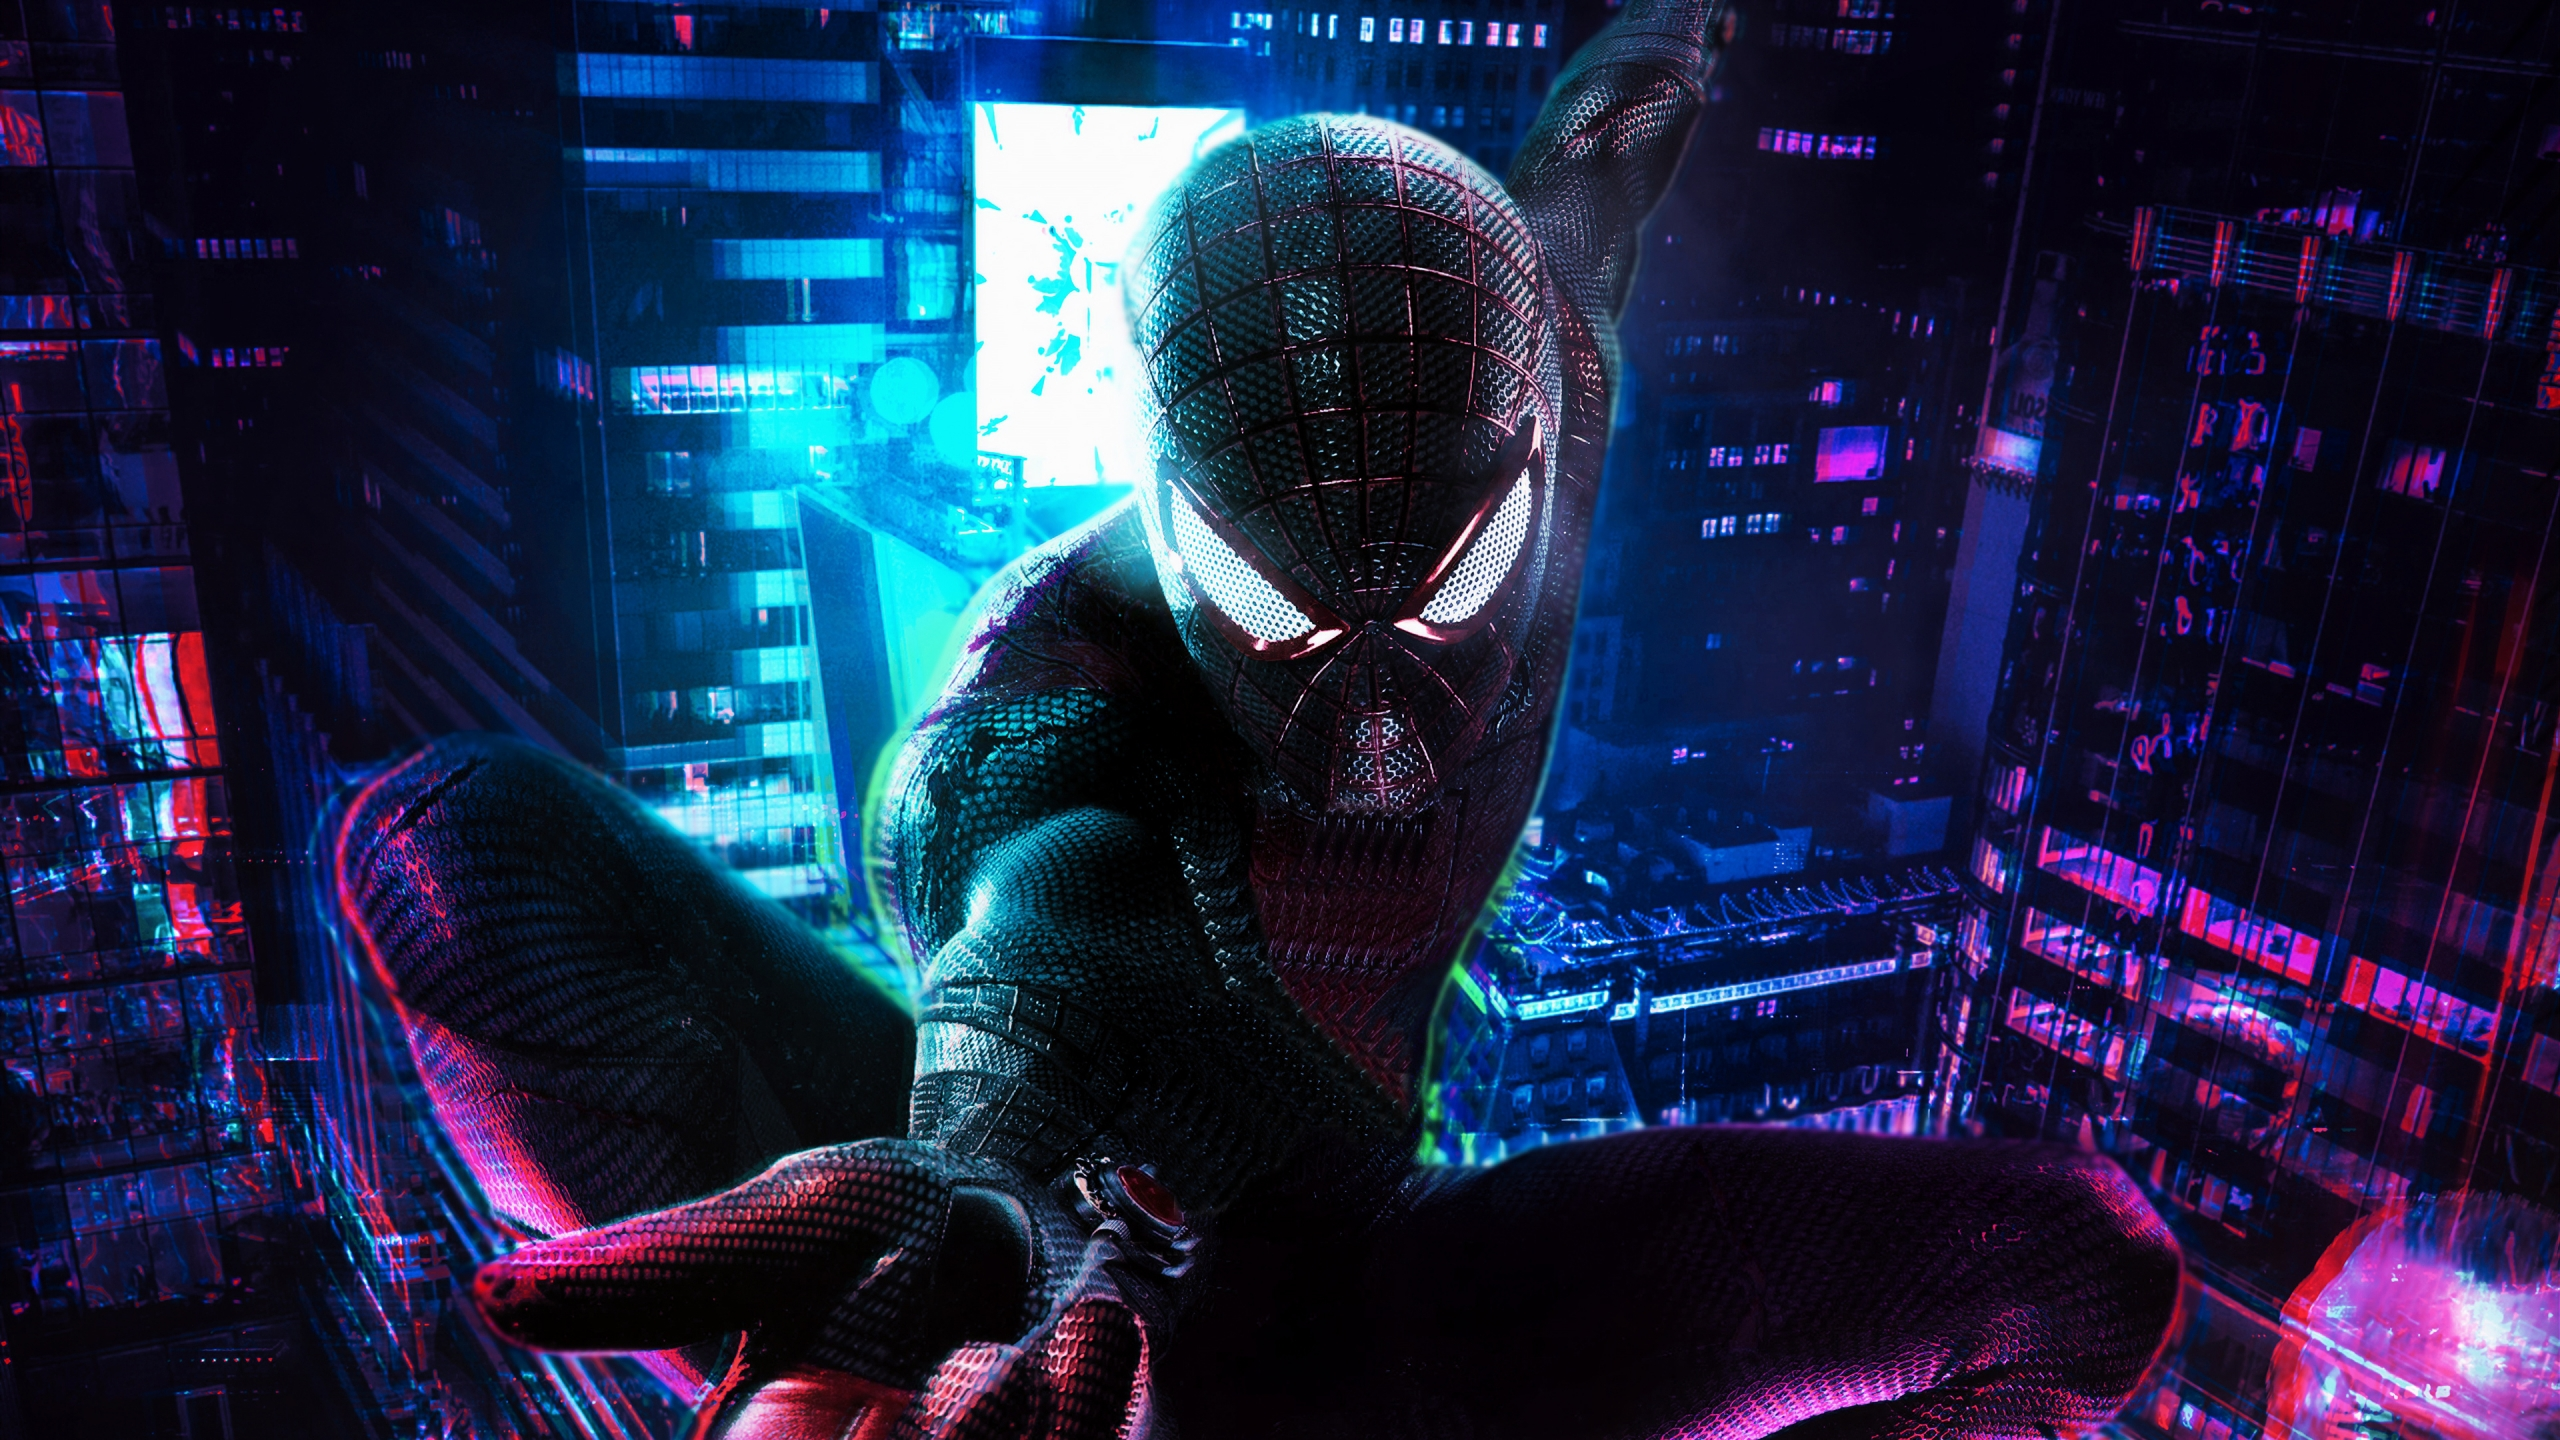 Cyberpunk Spiderman Fanart Wallpaper 4k Ultra Hd Id3239